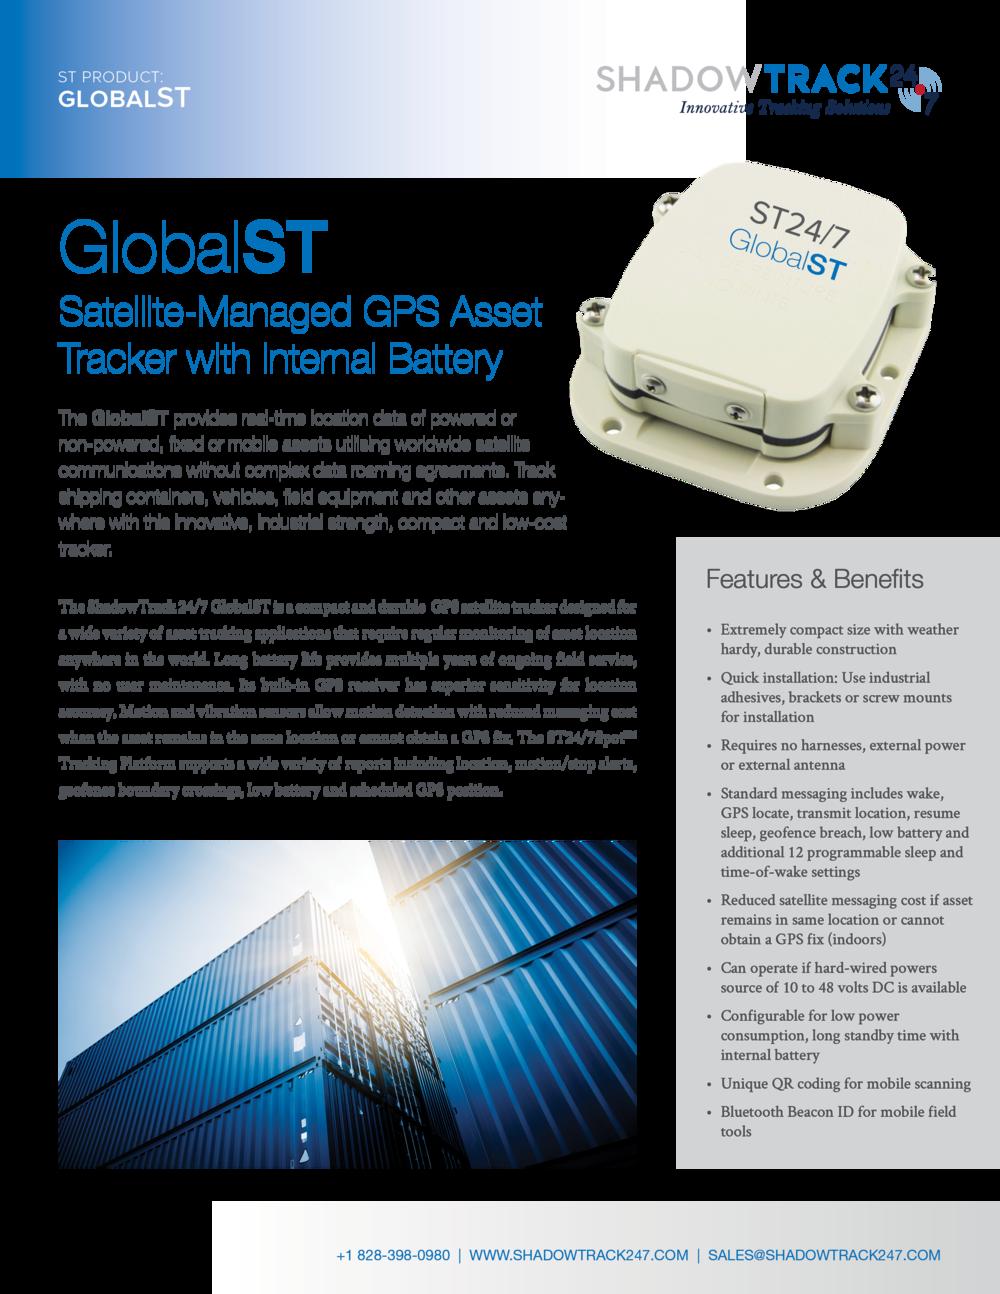 ST247_GlobalST